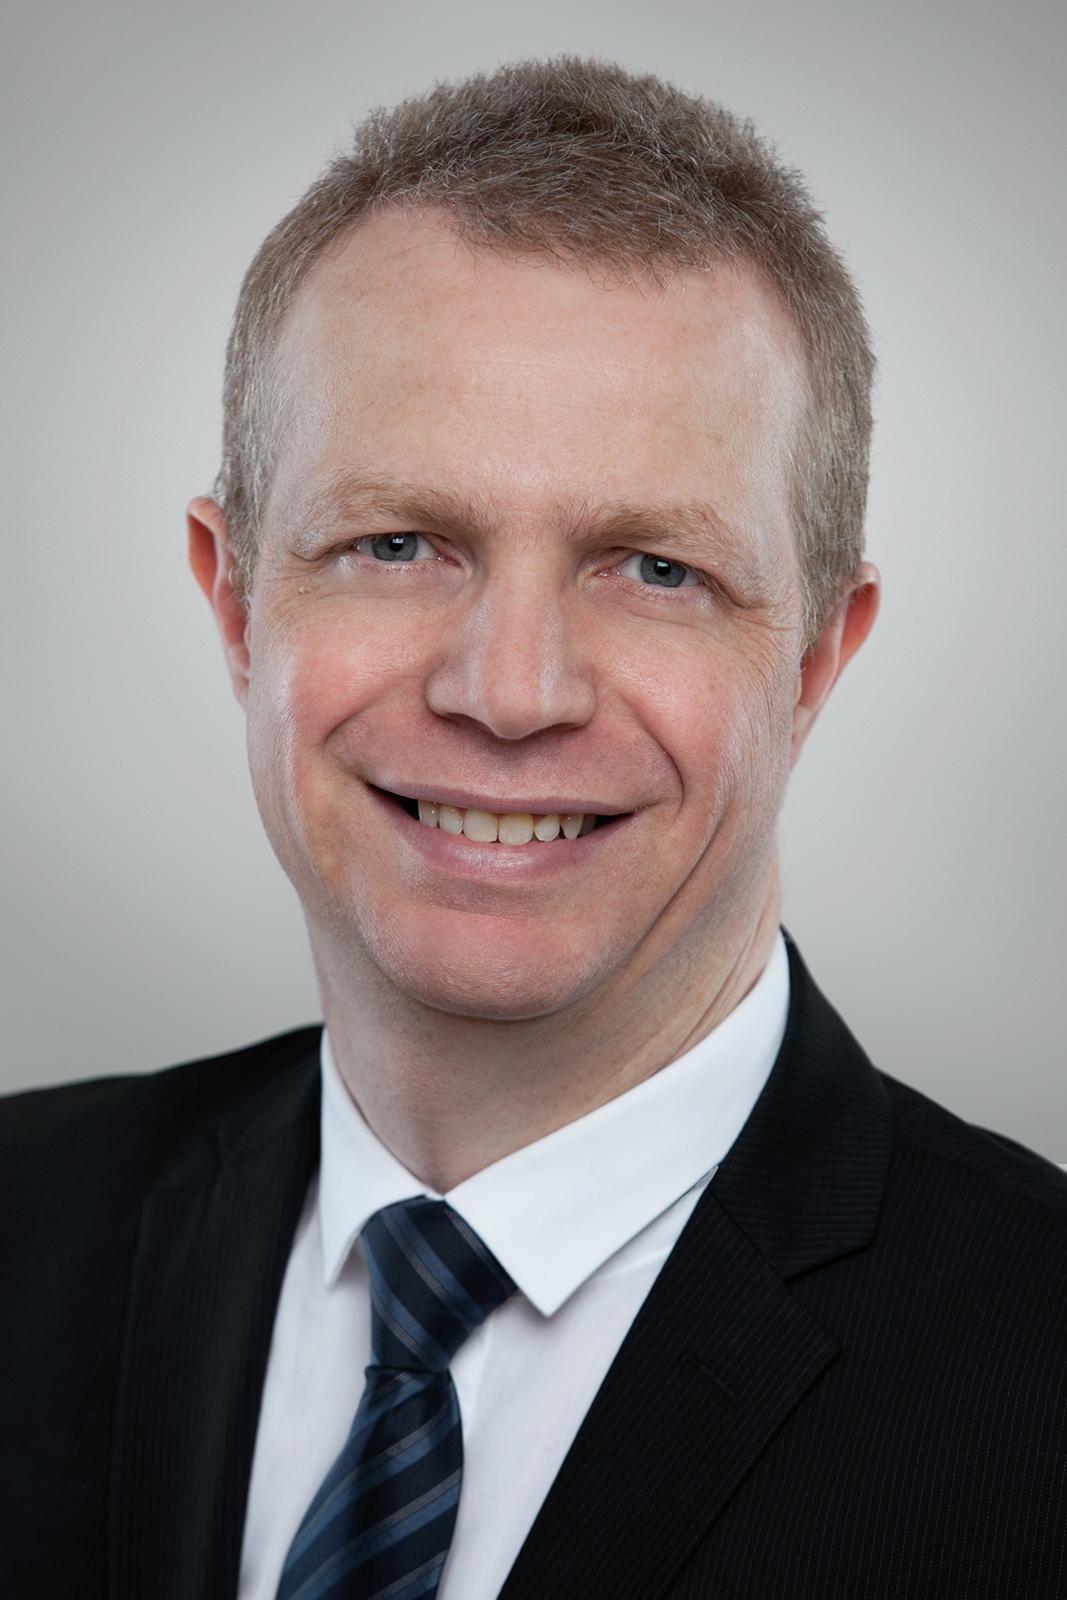 Prof. Dr. Arno Wacker